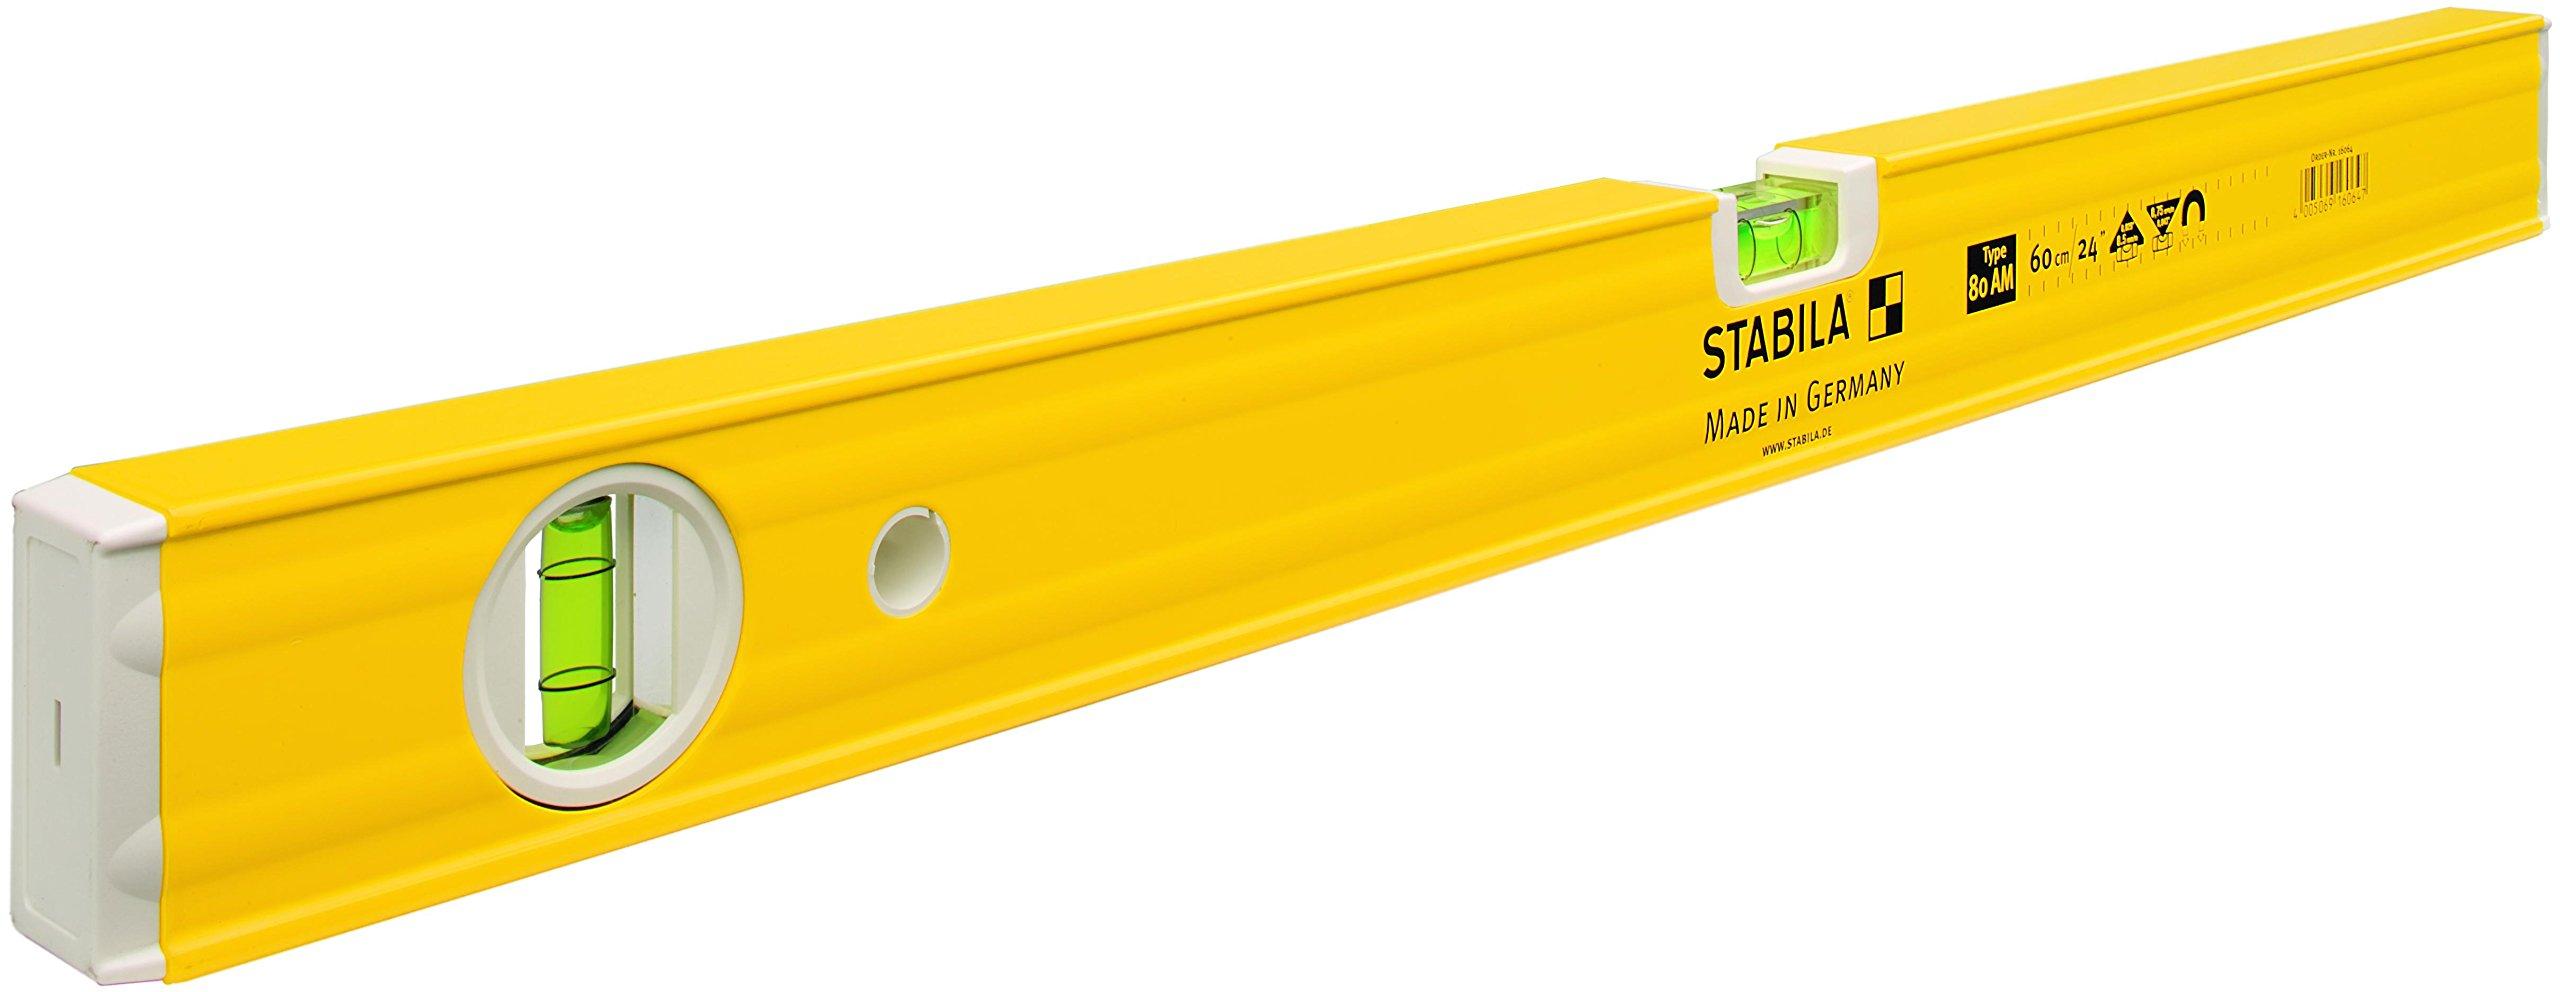 Stabila - 80Am Magnetic Level 2 Vial 80Cm 16065